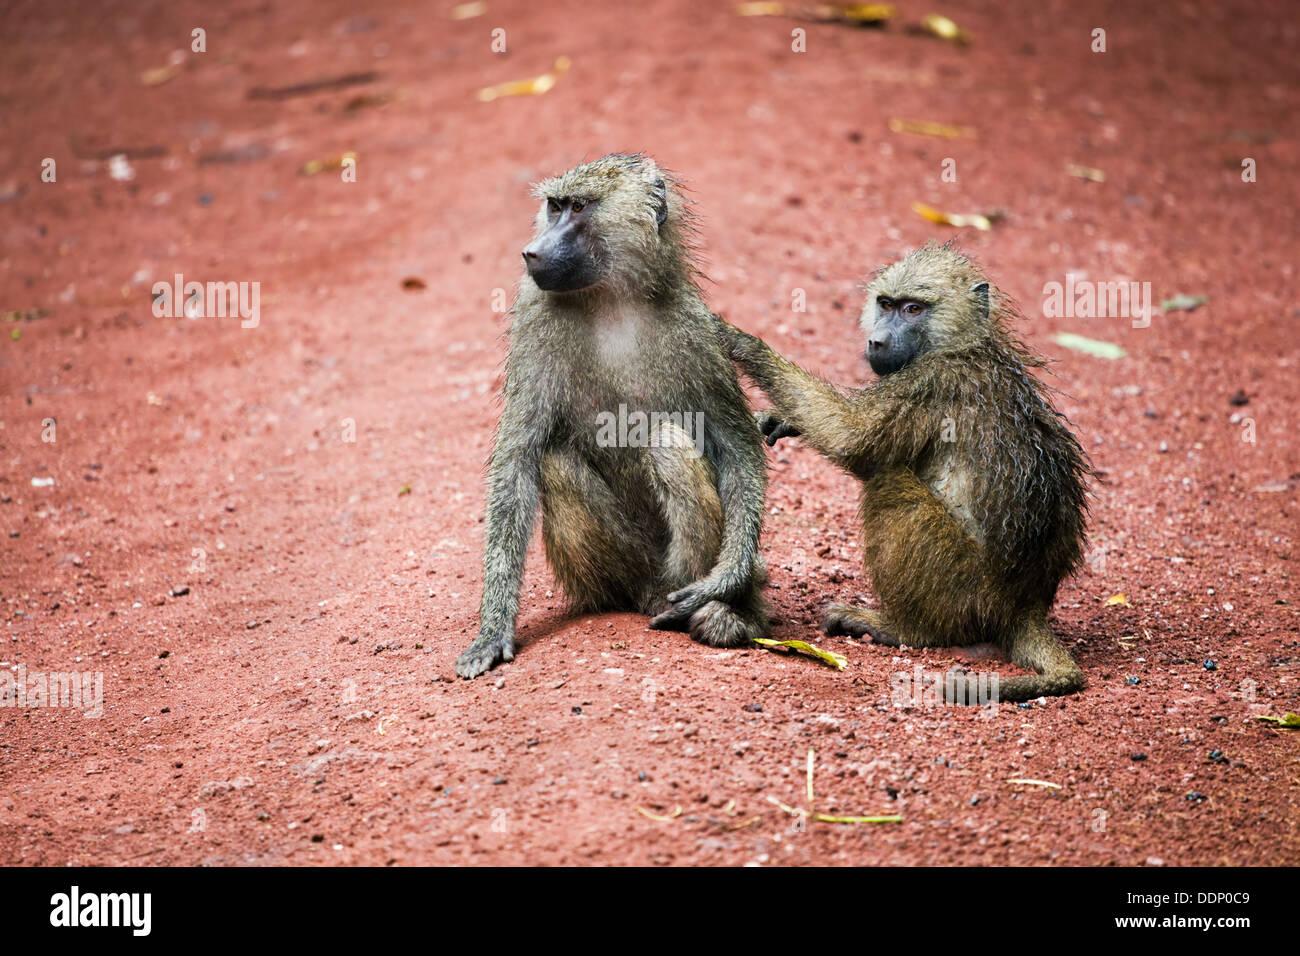 Two Baboon monkeys grooming in African bush at Lake Manyara National Park in Tanzania - Stock Image